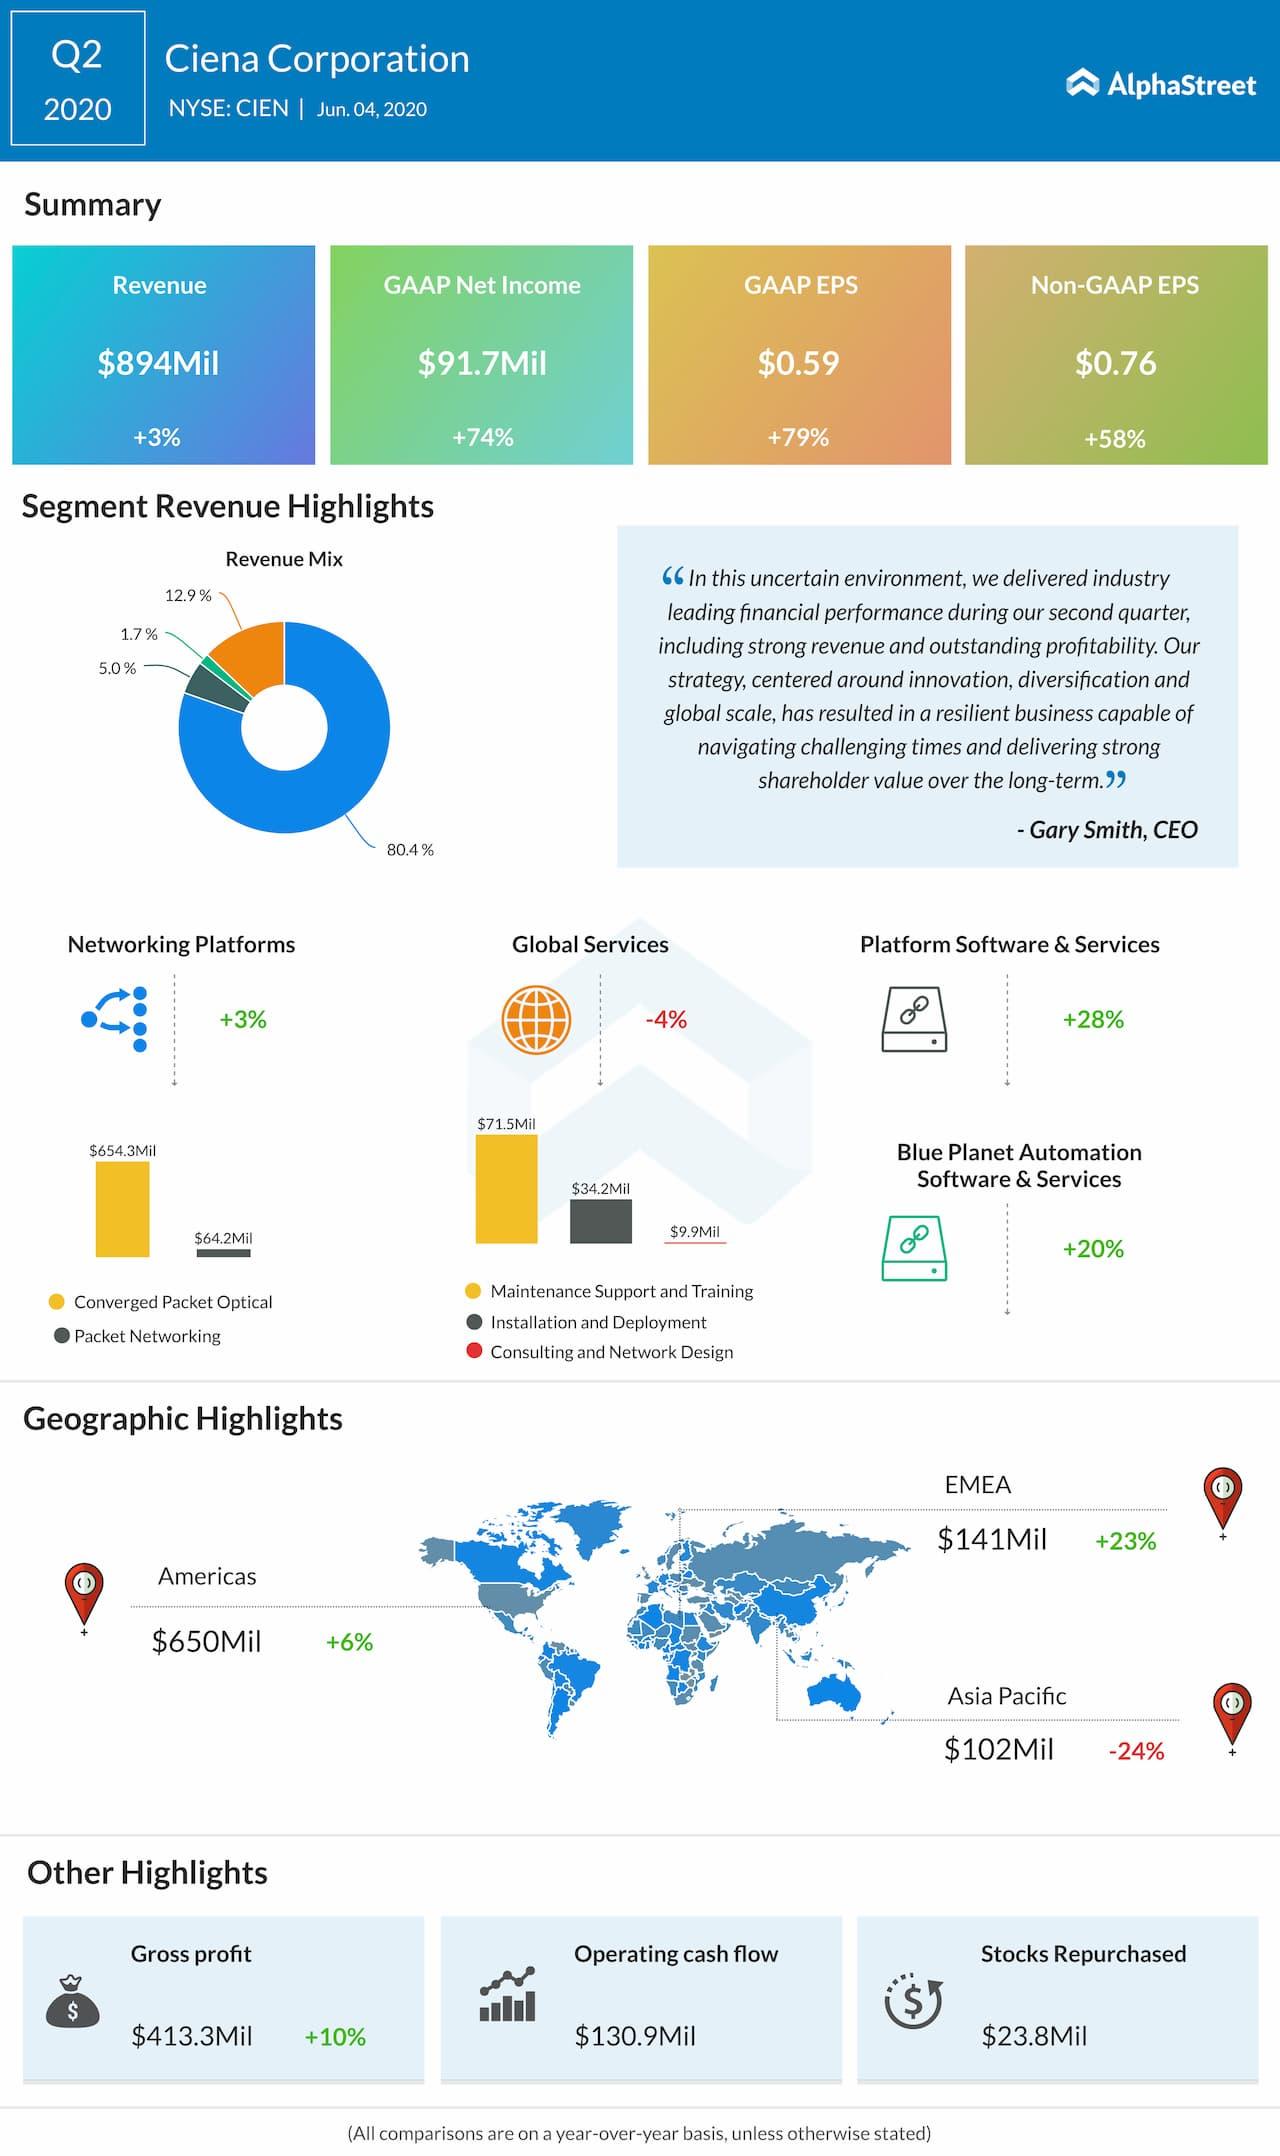 Ciena Corporation (CIEN) Q2 2020 earnings